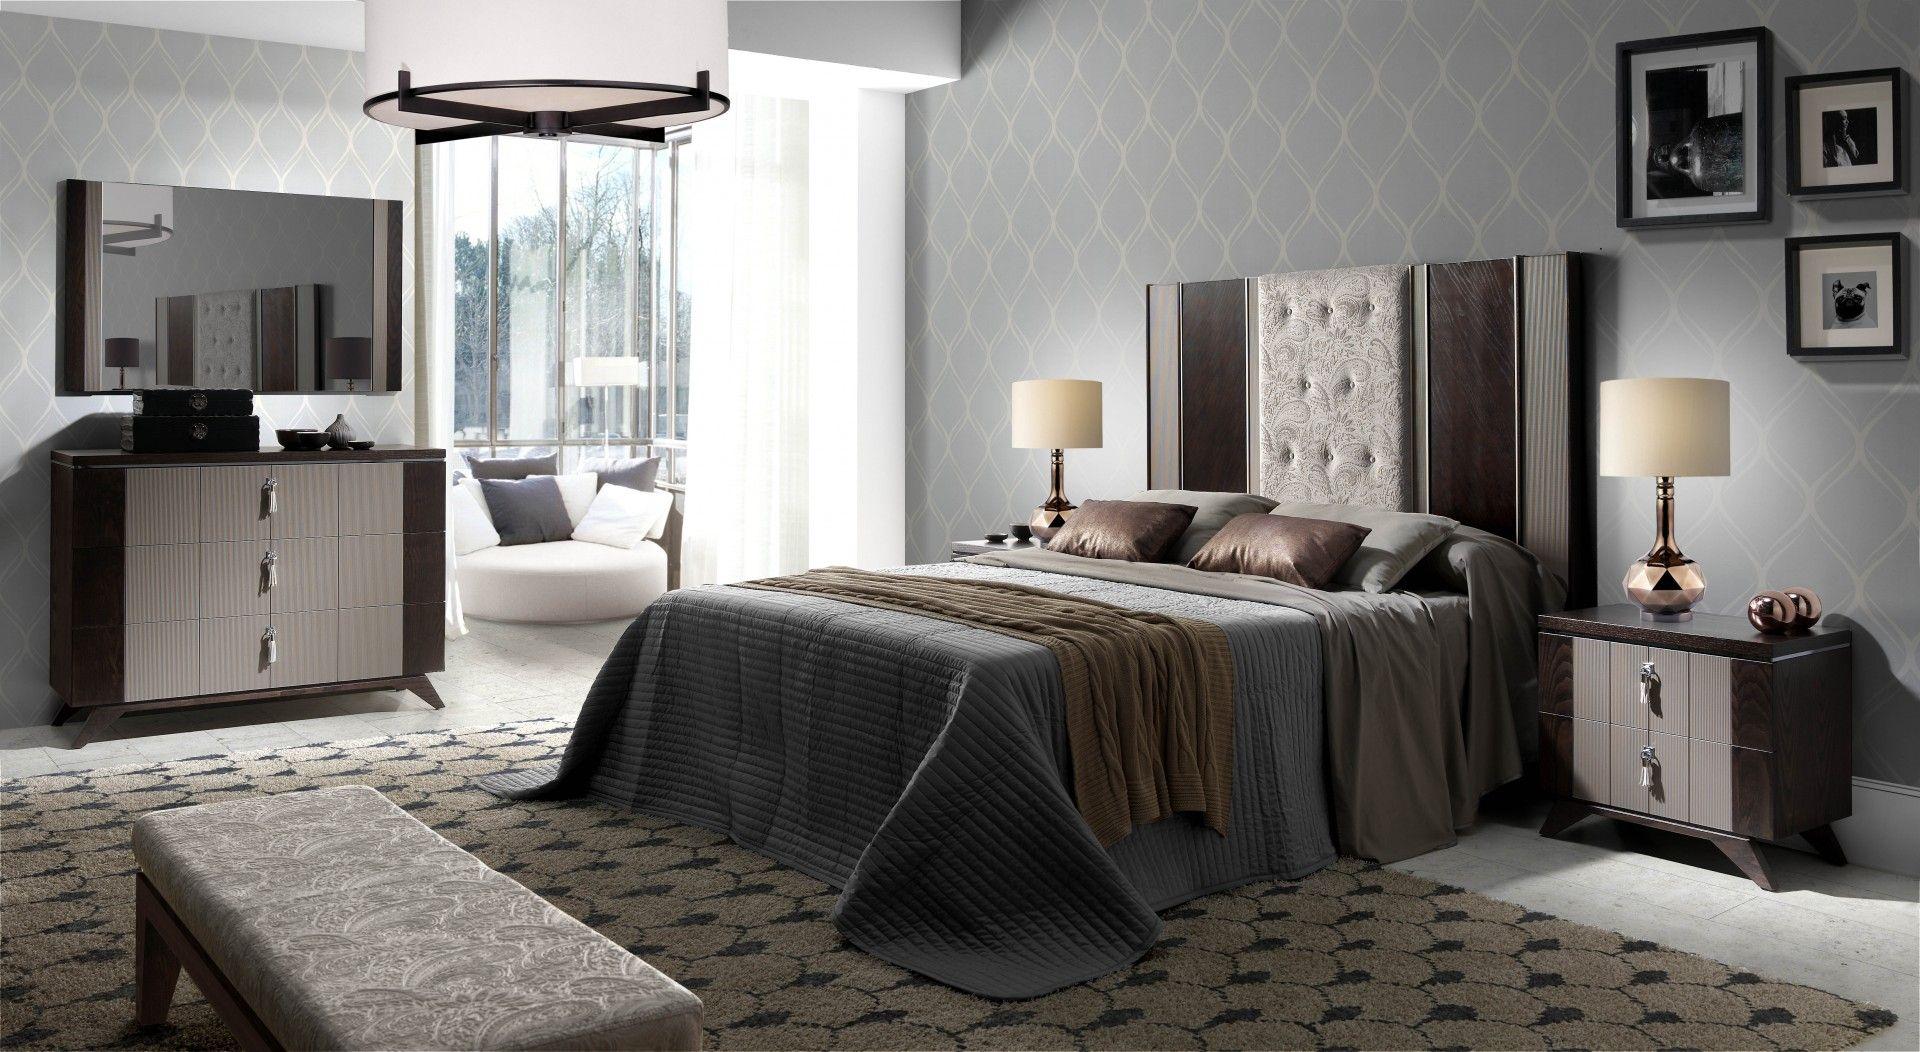 Decoraci n e interiorismo para dormitorio contempor neo - Muebles casal valencia ...